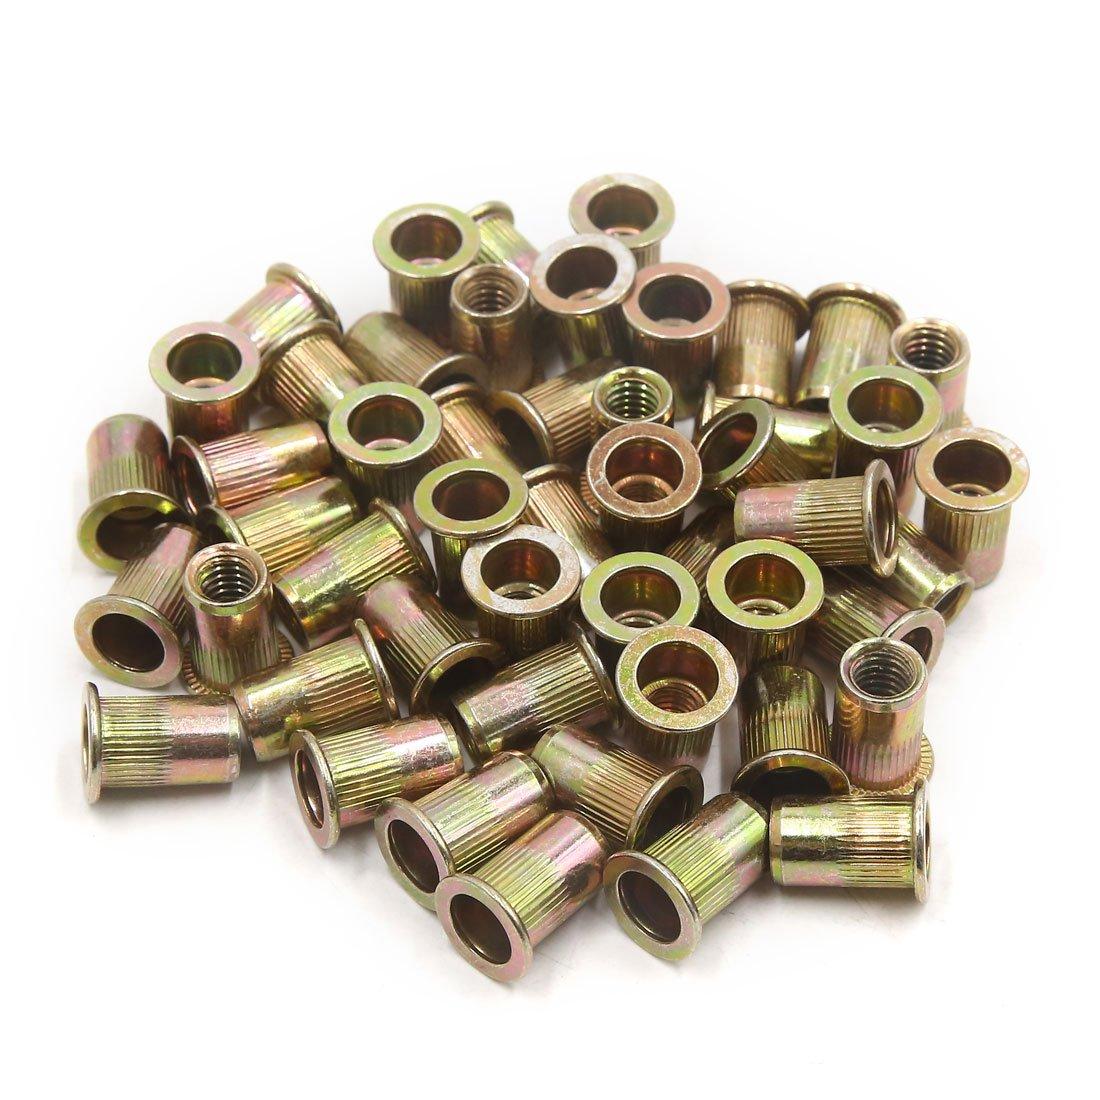 uxcell a17073100ux0534 50Pcs Zinc Plated Carbon Steel Car Rivet Nut Flat Head Threaded Insert Nutsert 5/16-18, 50 Pack